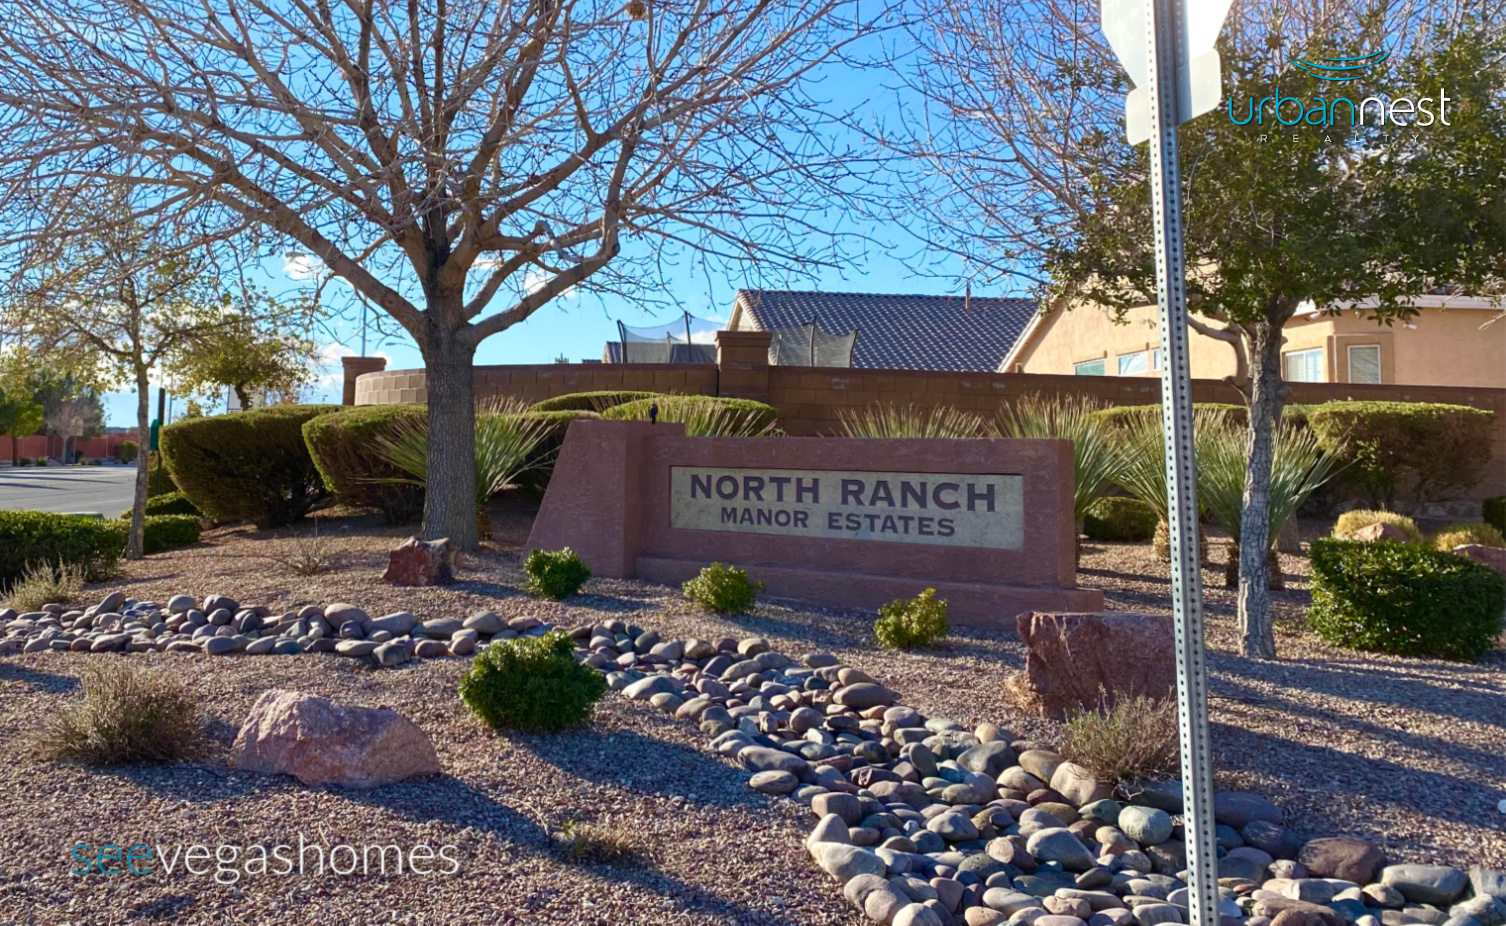 North_Ranch_Manor_Estates_North_Las_Vegas_NV_89084_SeeVegasHomes